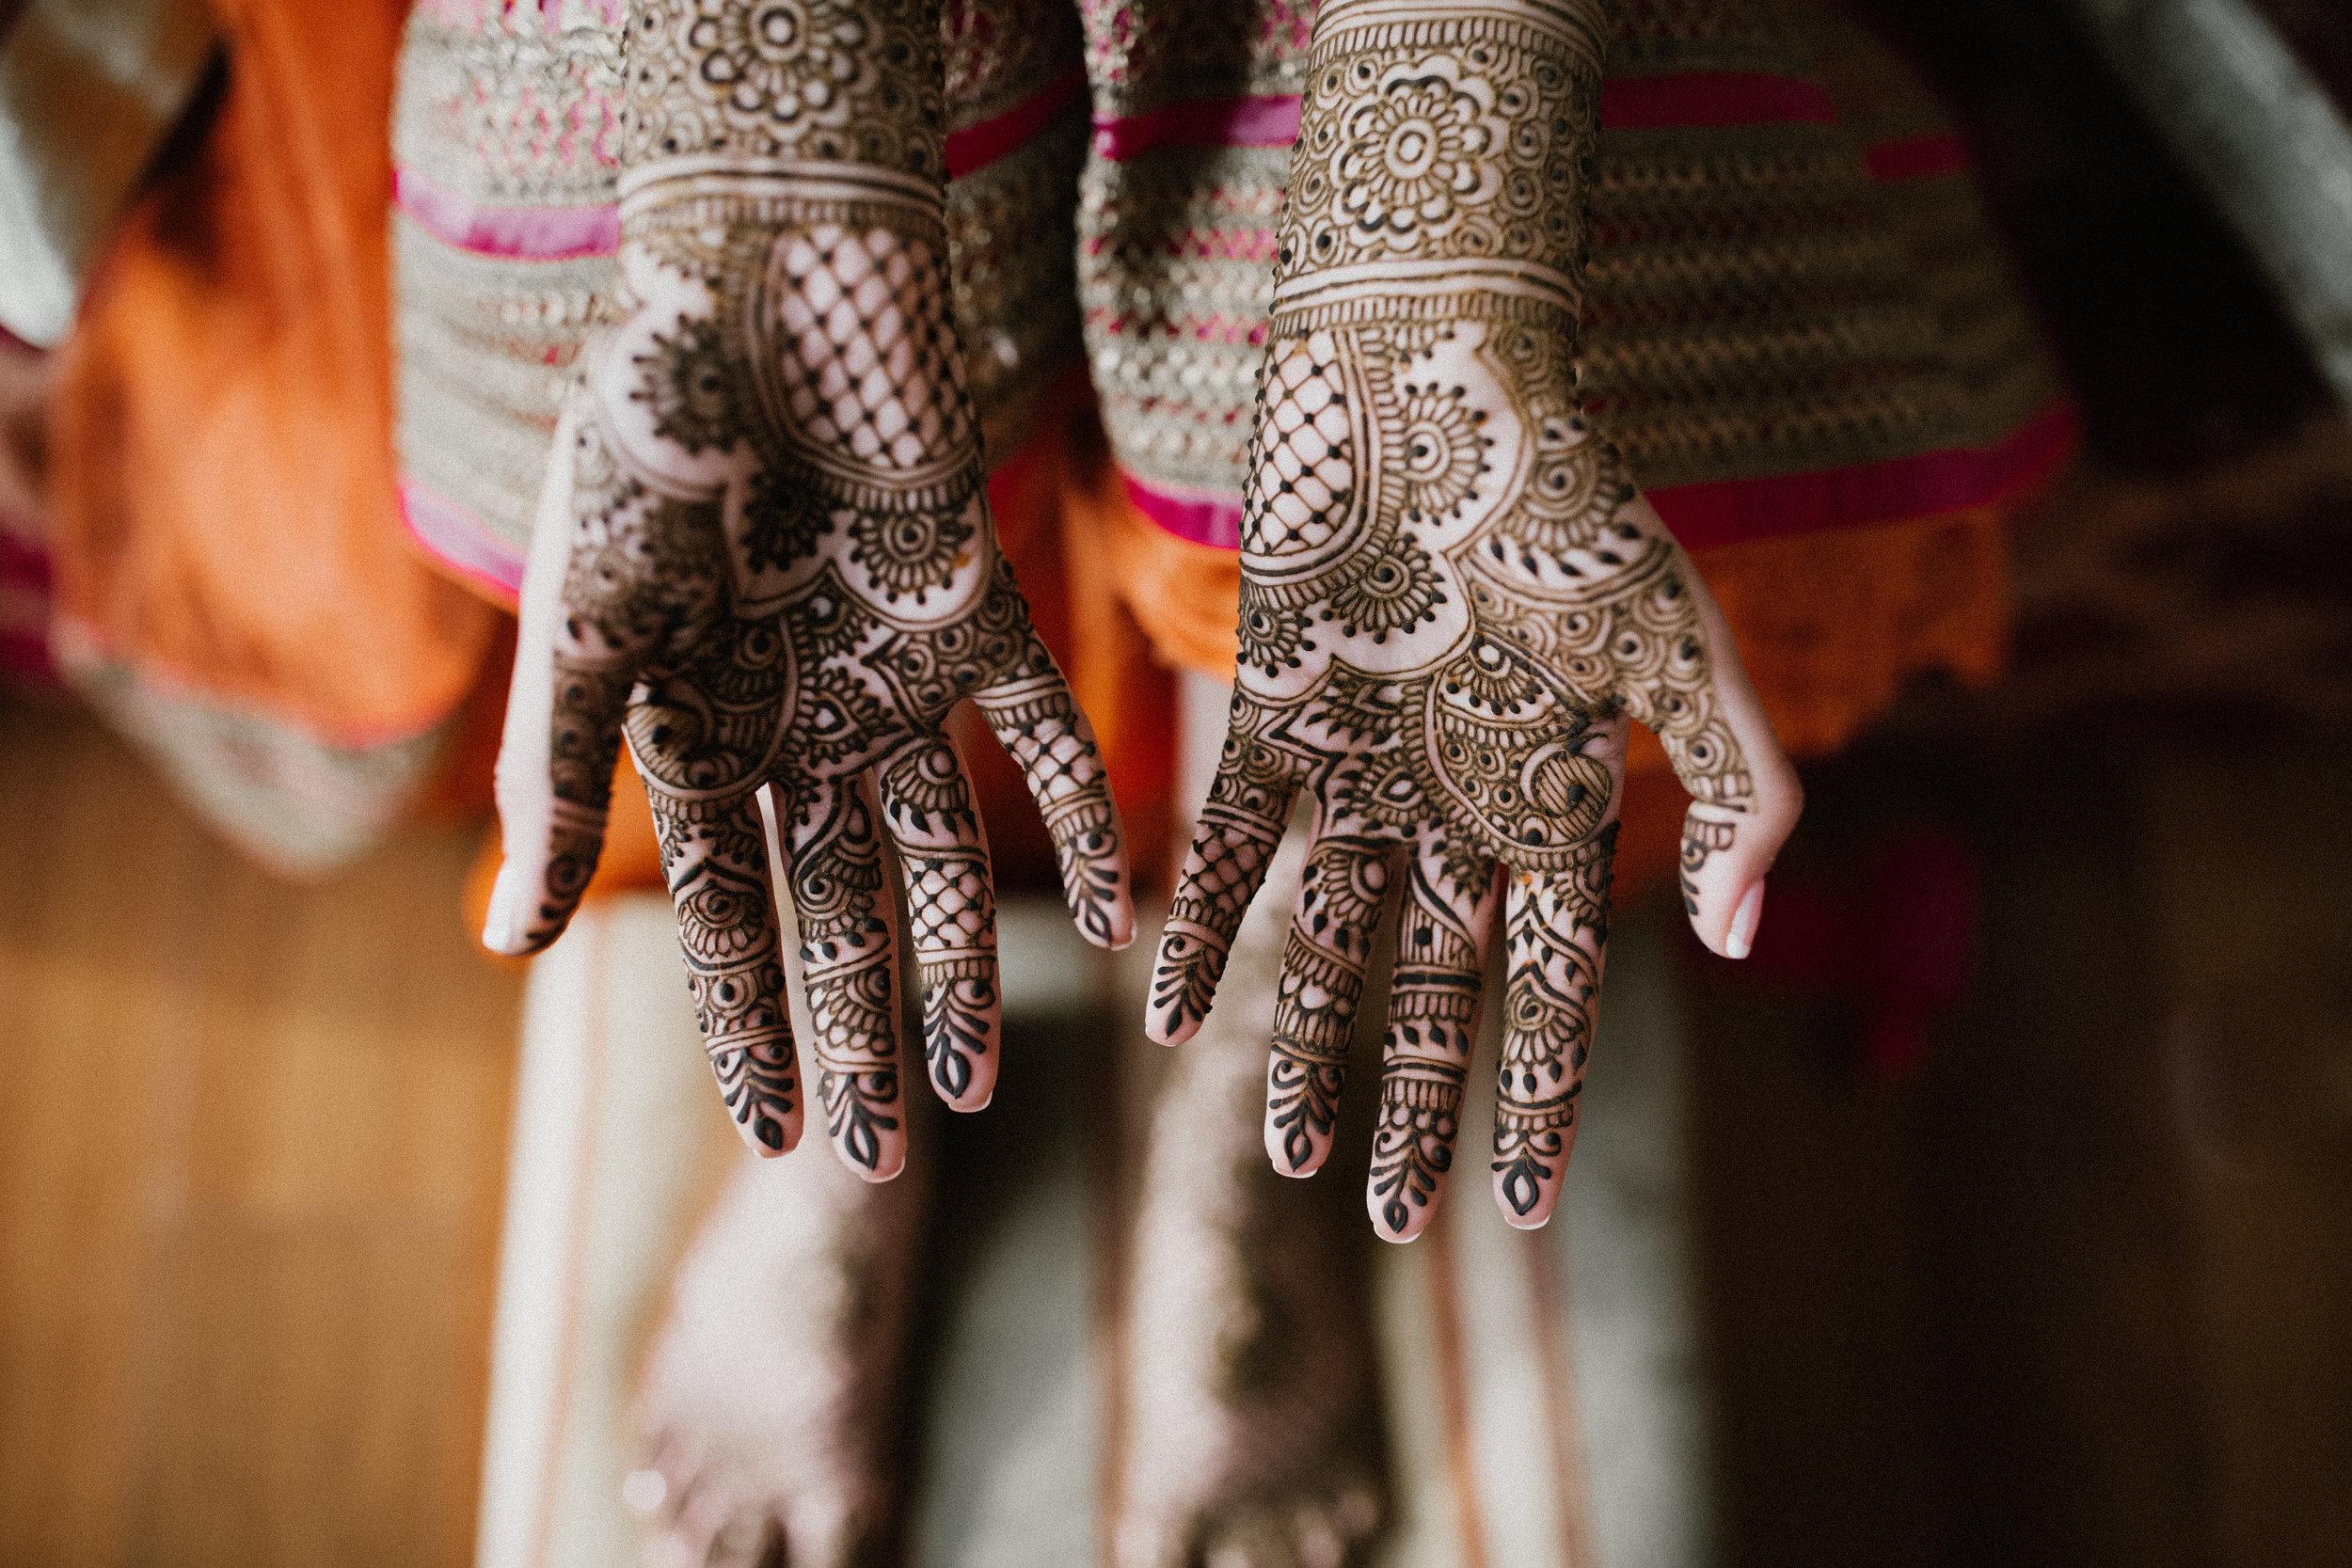 Aparna-Ankit-Patel-Mehndi-Wedding-Photos-0026.jpg